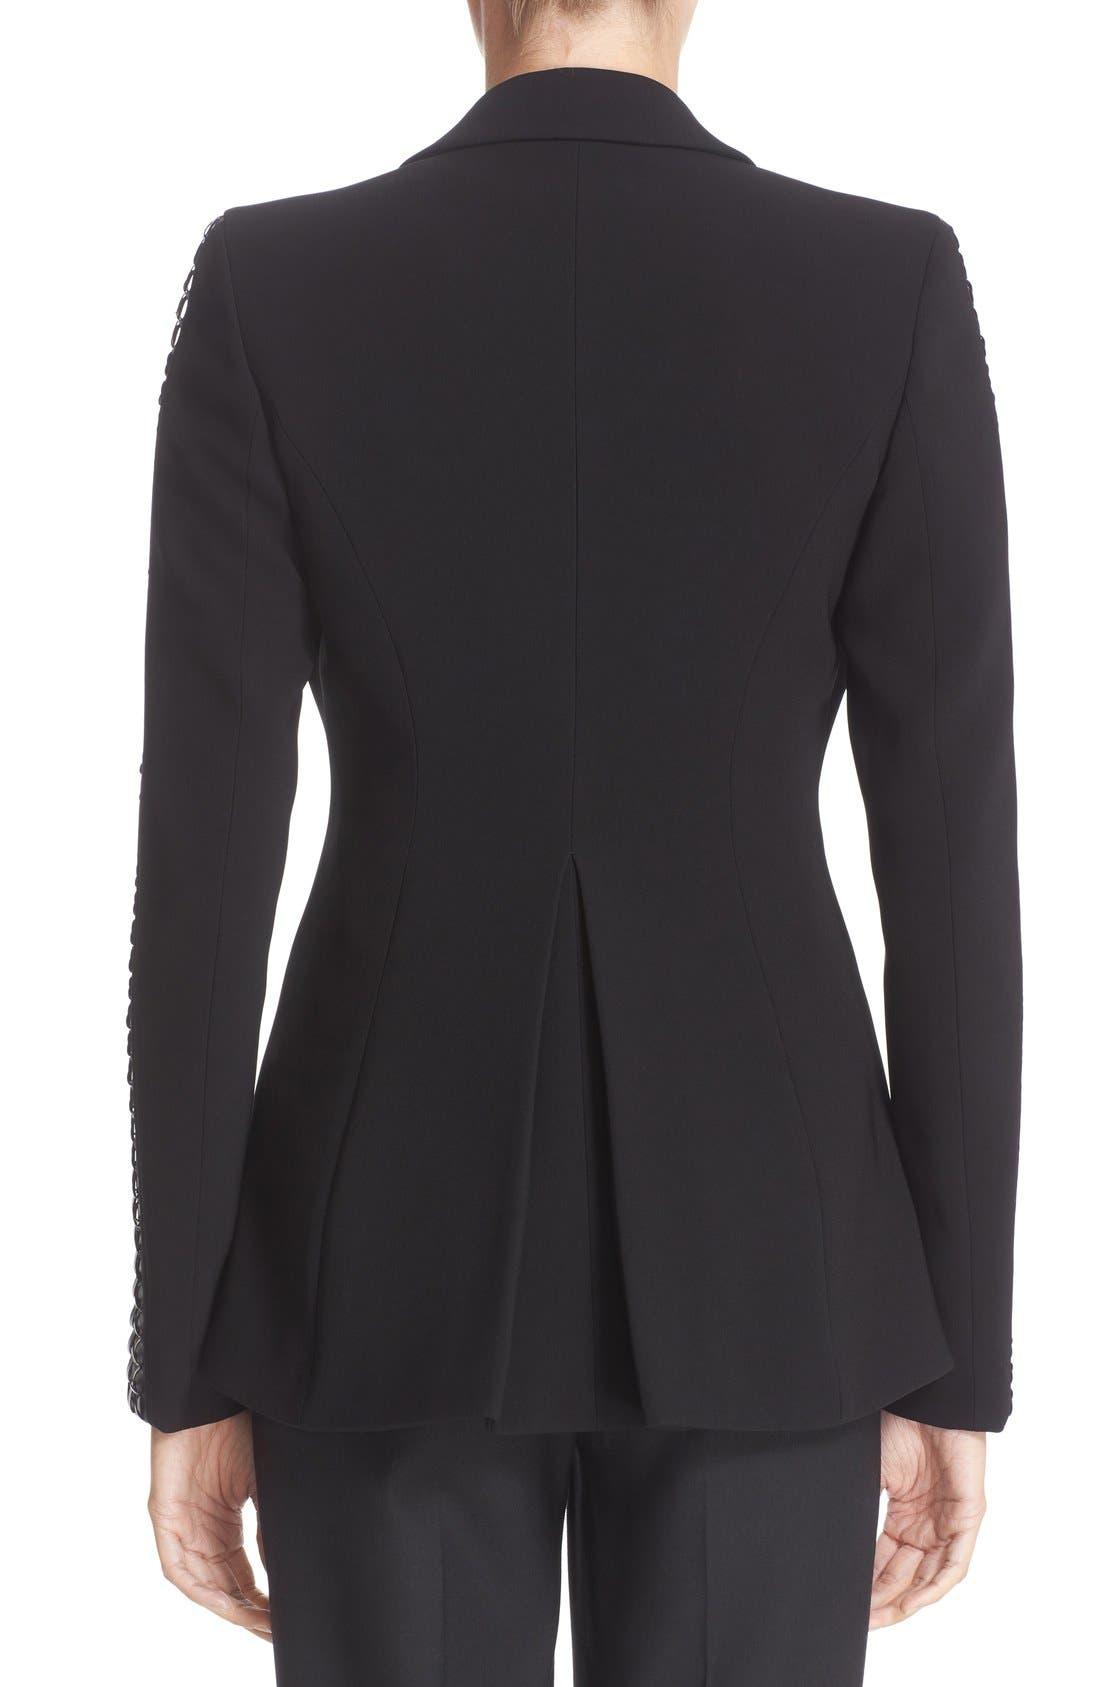 Acacia Lace Detail Jacket,                             Alternate thumbnail 2, color,                             Black